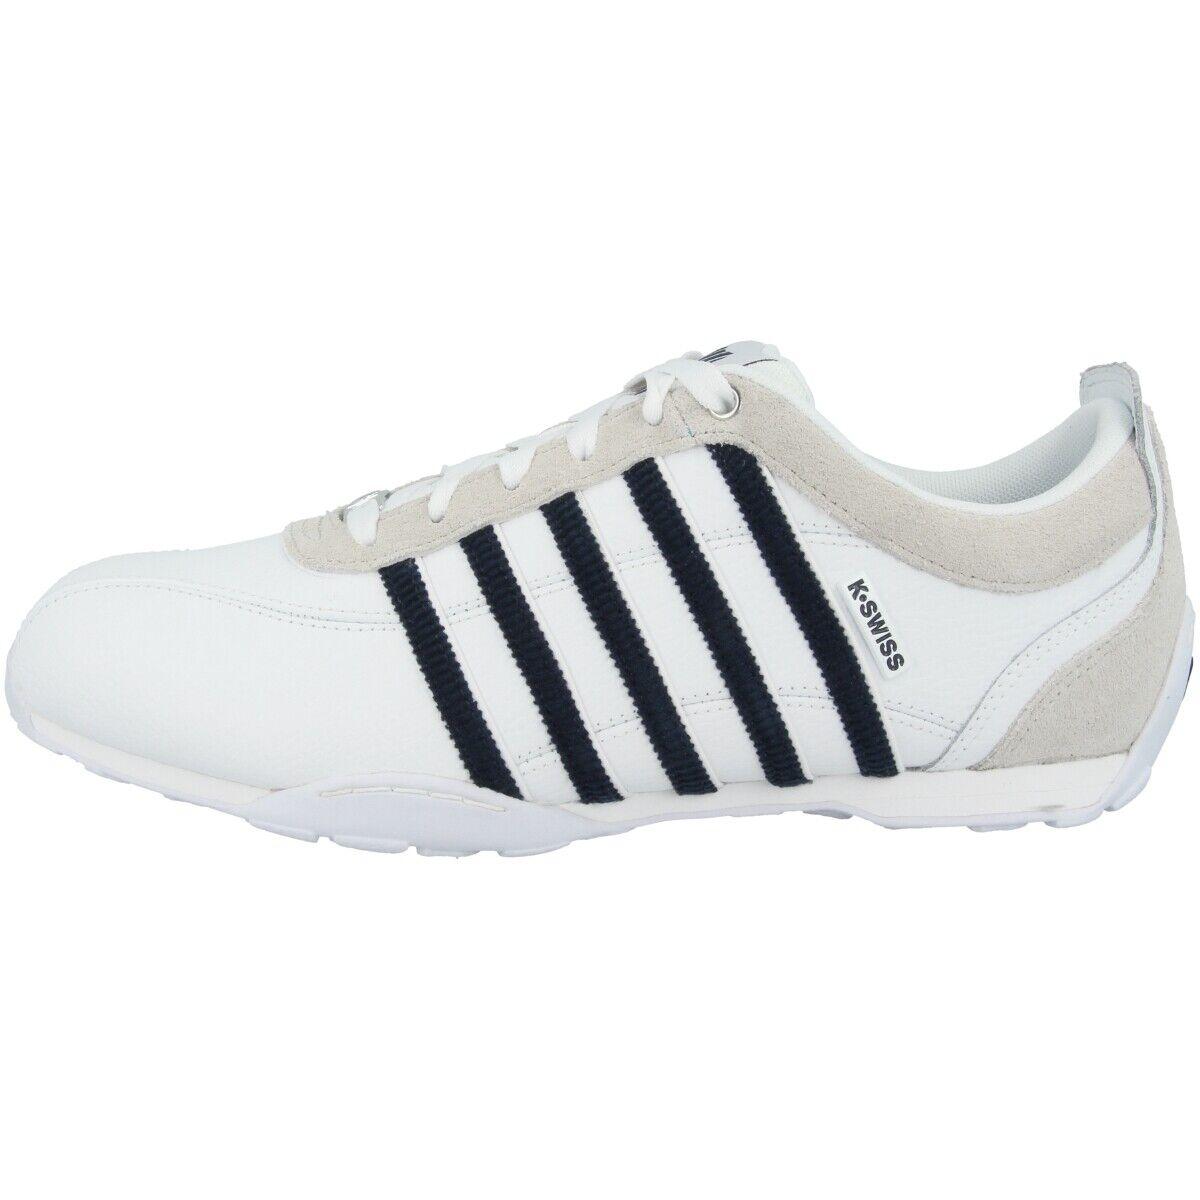 K-swiss Arvee 1.5 baskets Sport Chaussures Loisirs Baskets blanc Navy 02453-138